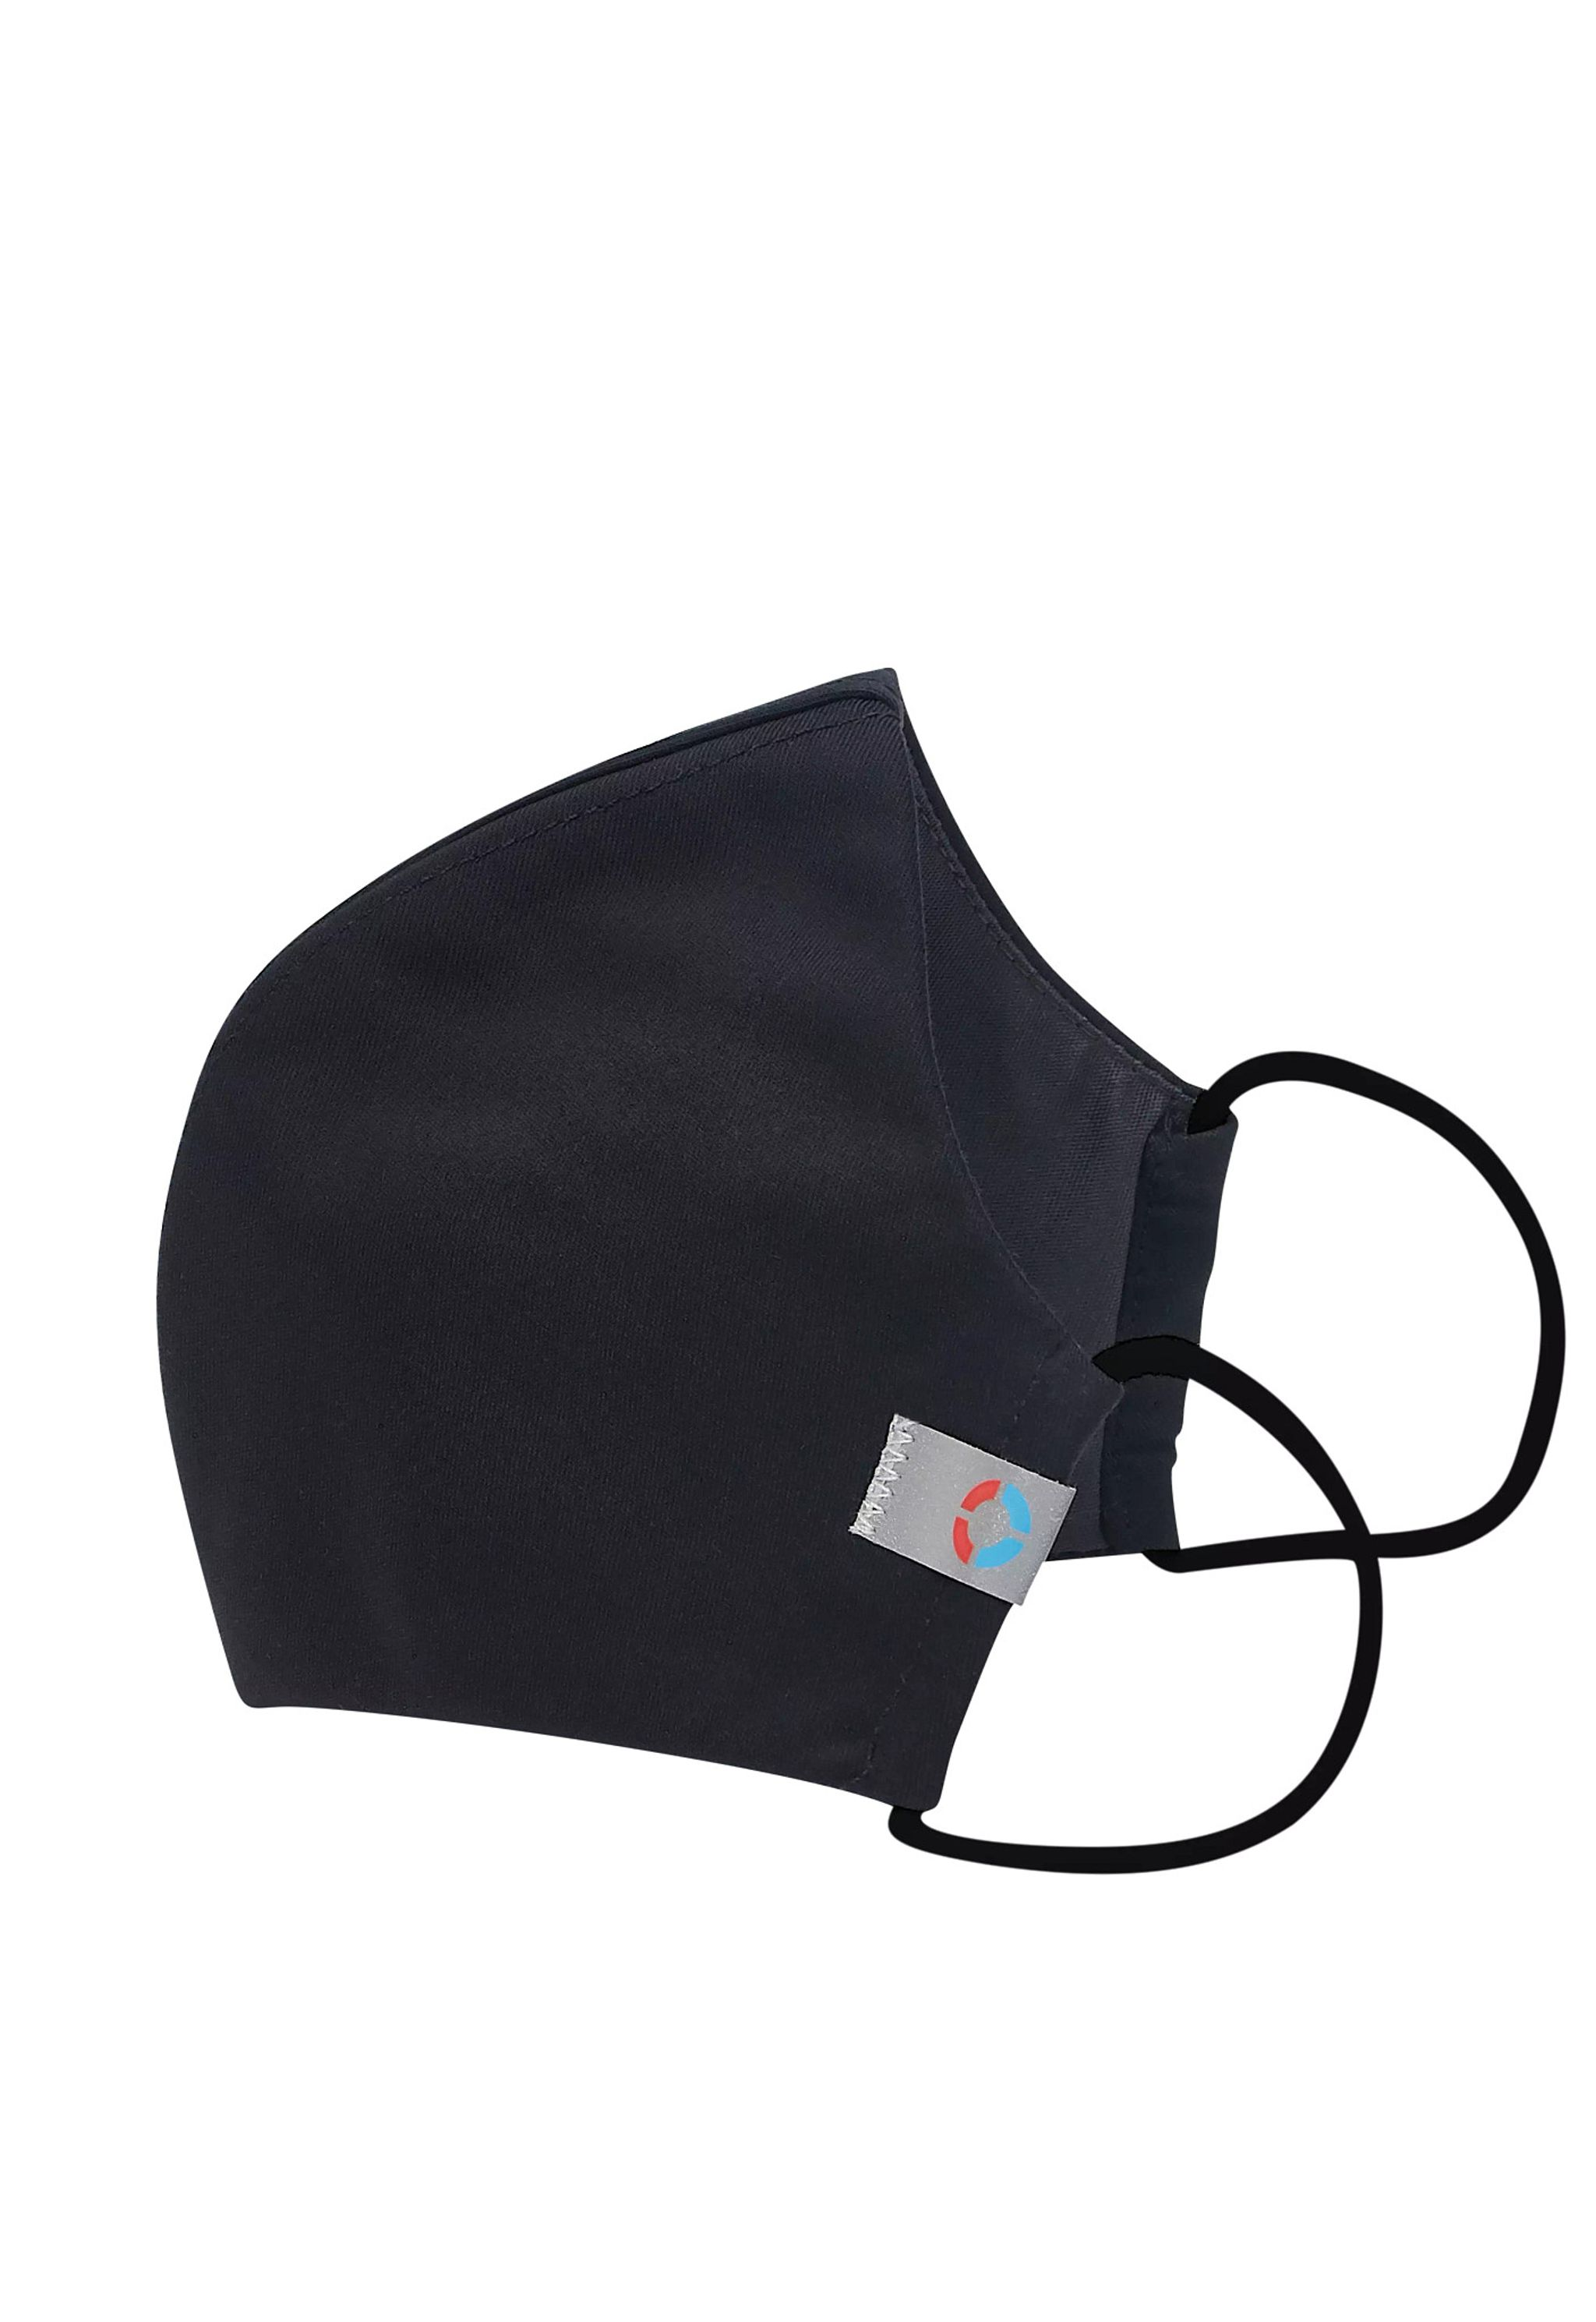 WW560AB - غطاء للوجه (كمامة)